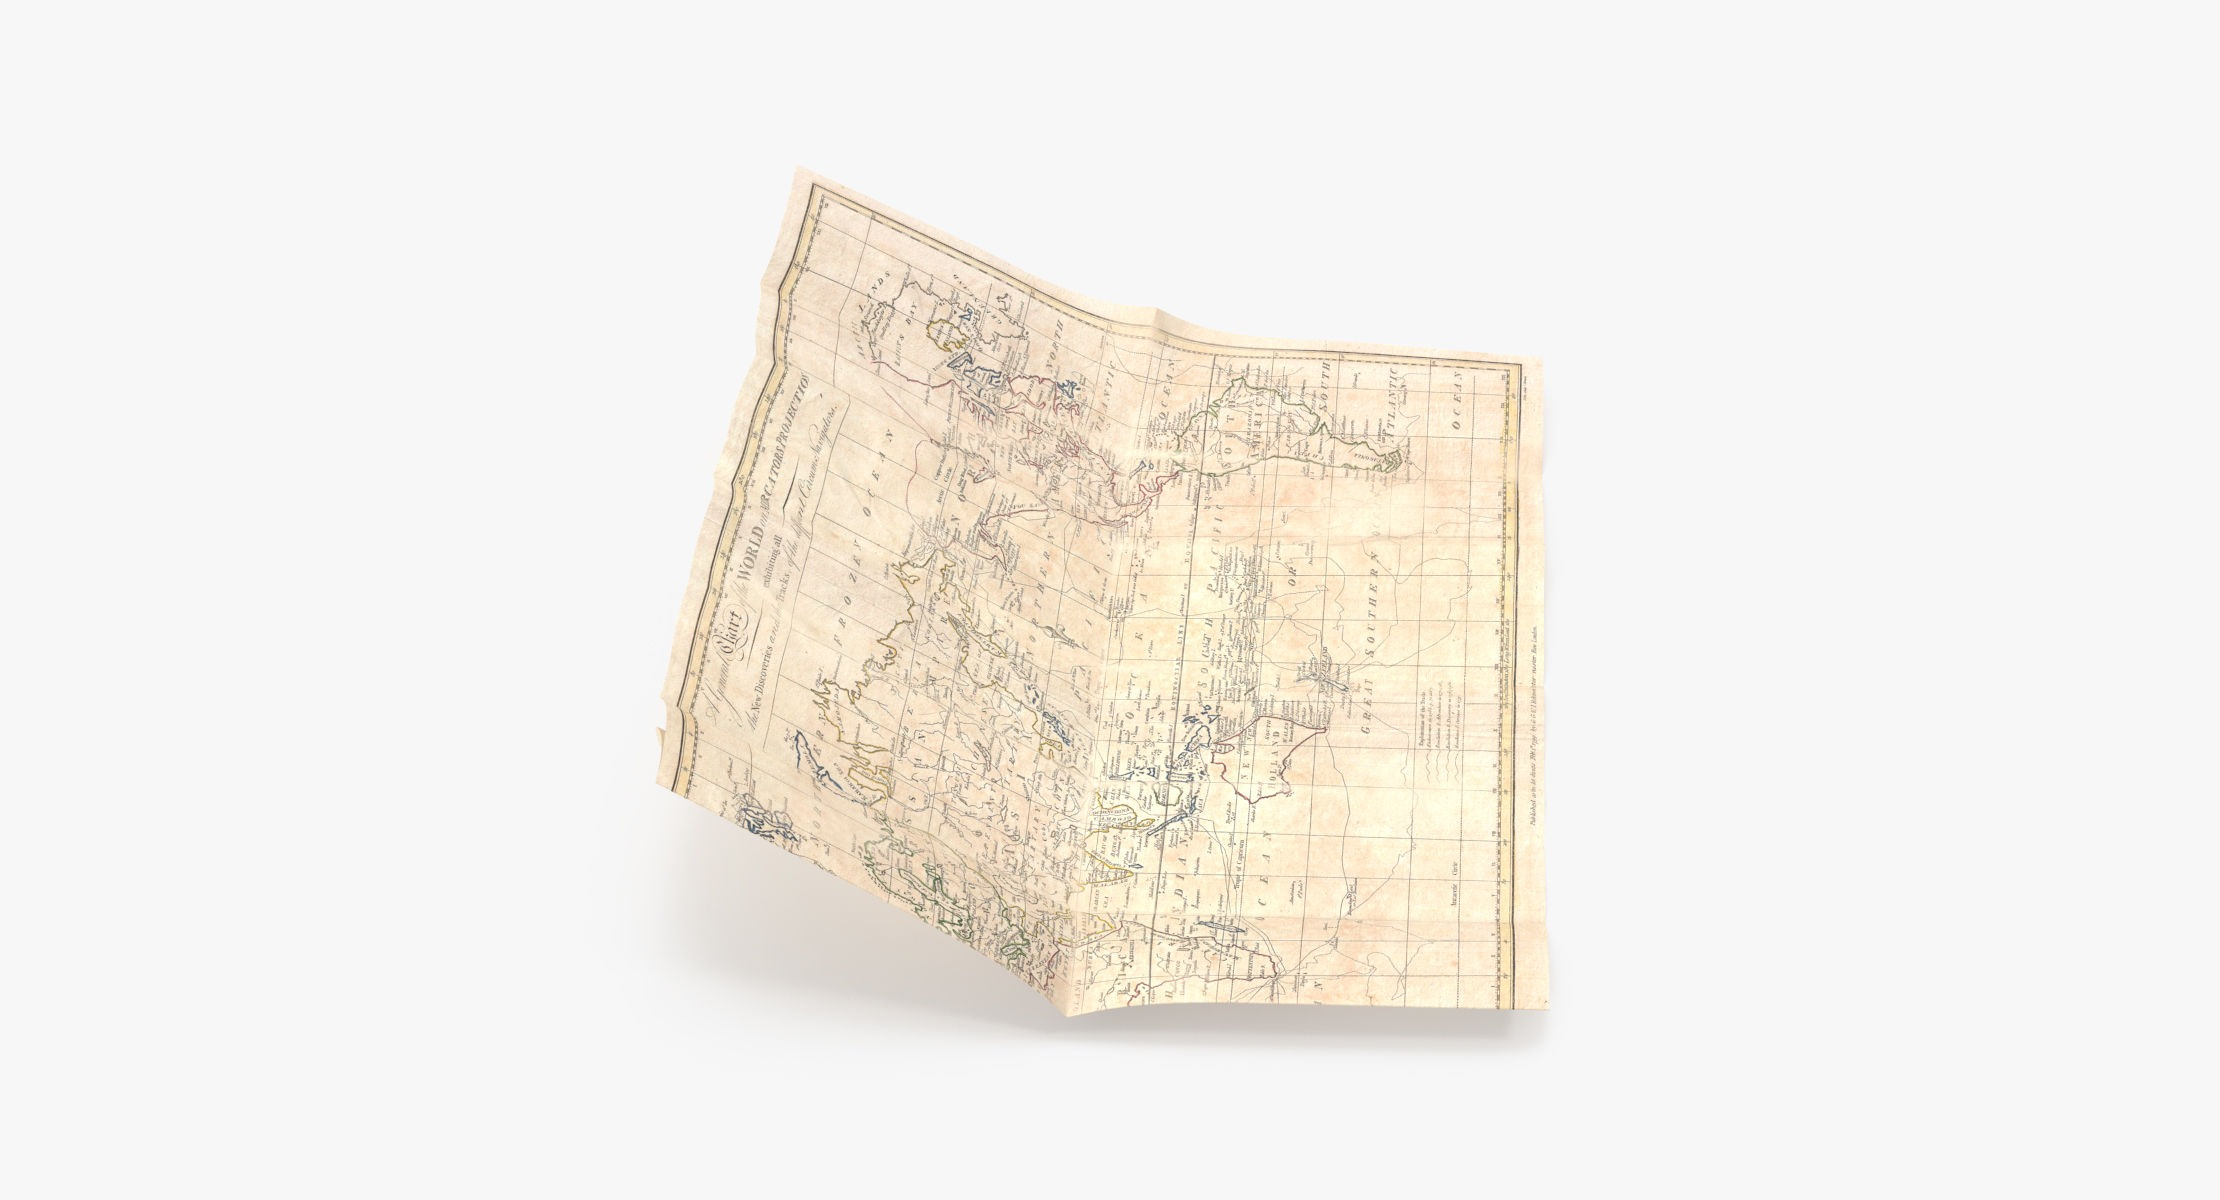 Retro Map 01 03 - reel 1